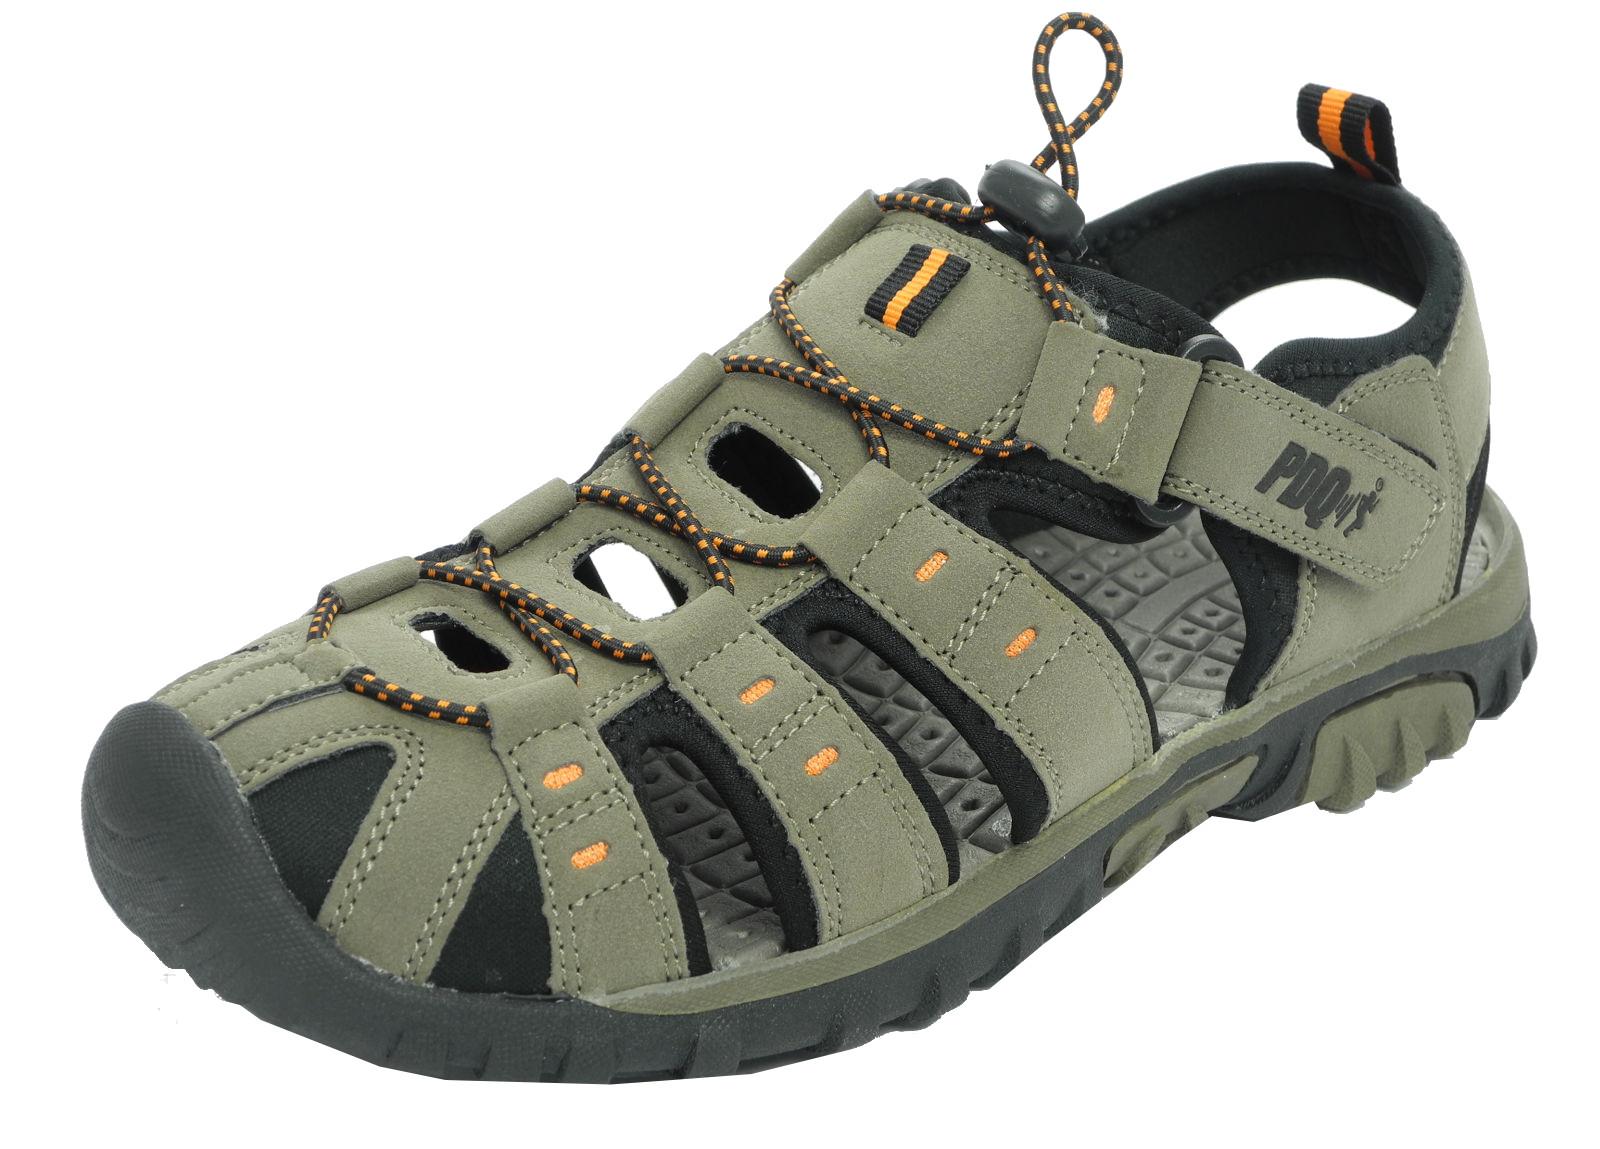 Black enclosed sandals - Mens Boys Pdq Sports Hiking Closed Toe Trail